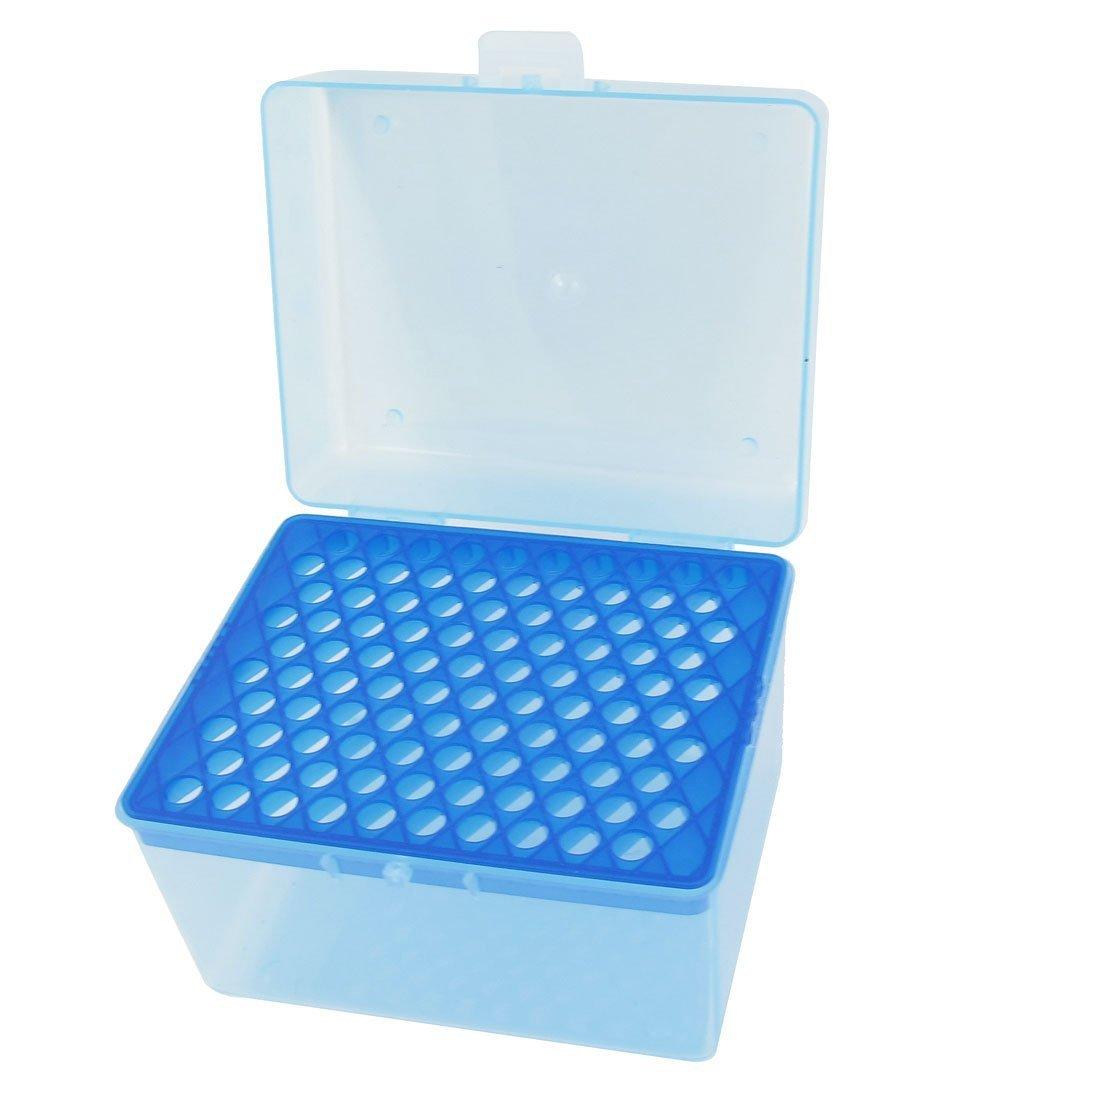 Caja portapipetas Laboratorio 100 Posiciones 1 ml, rectangular. Sourcingmap a14072300ux0283